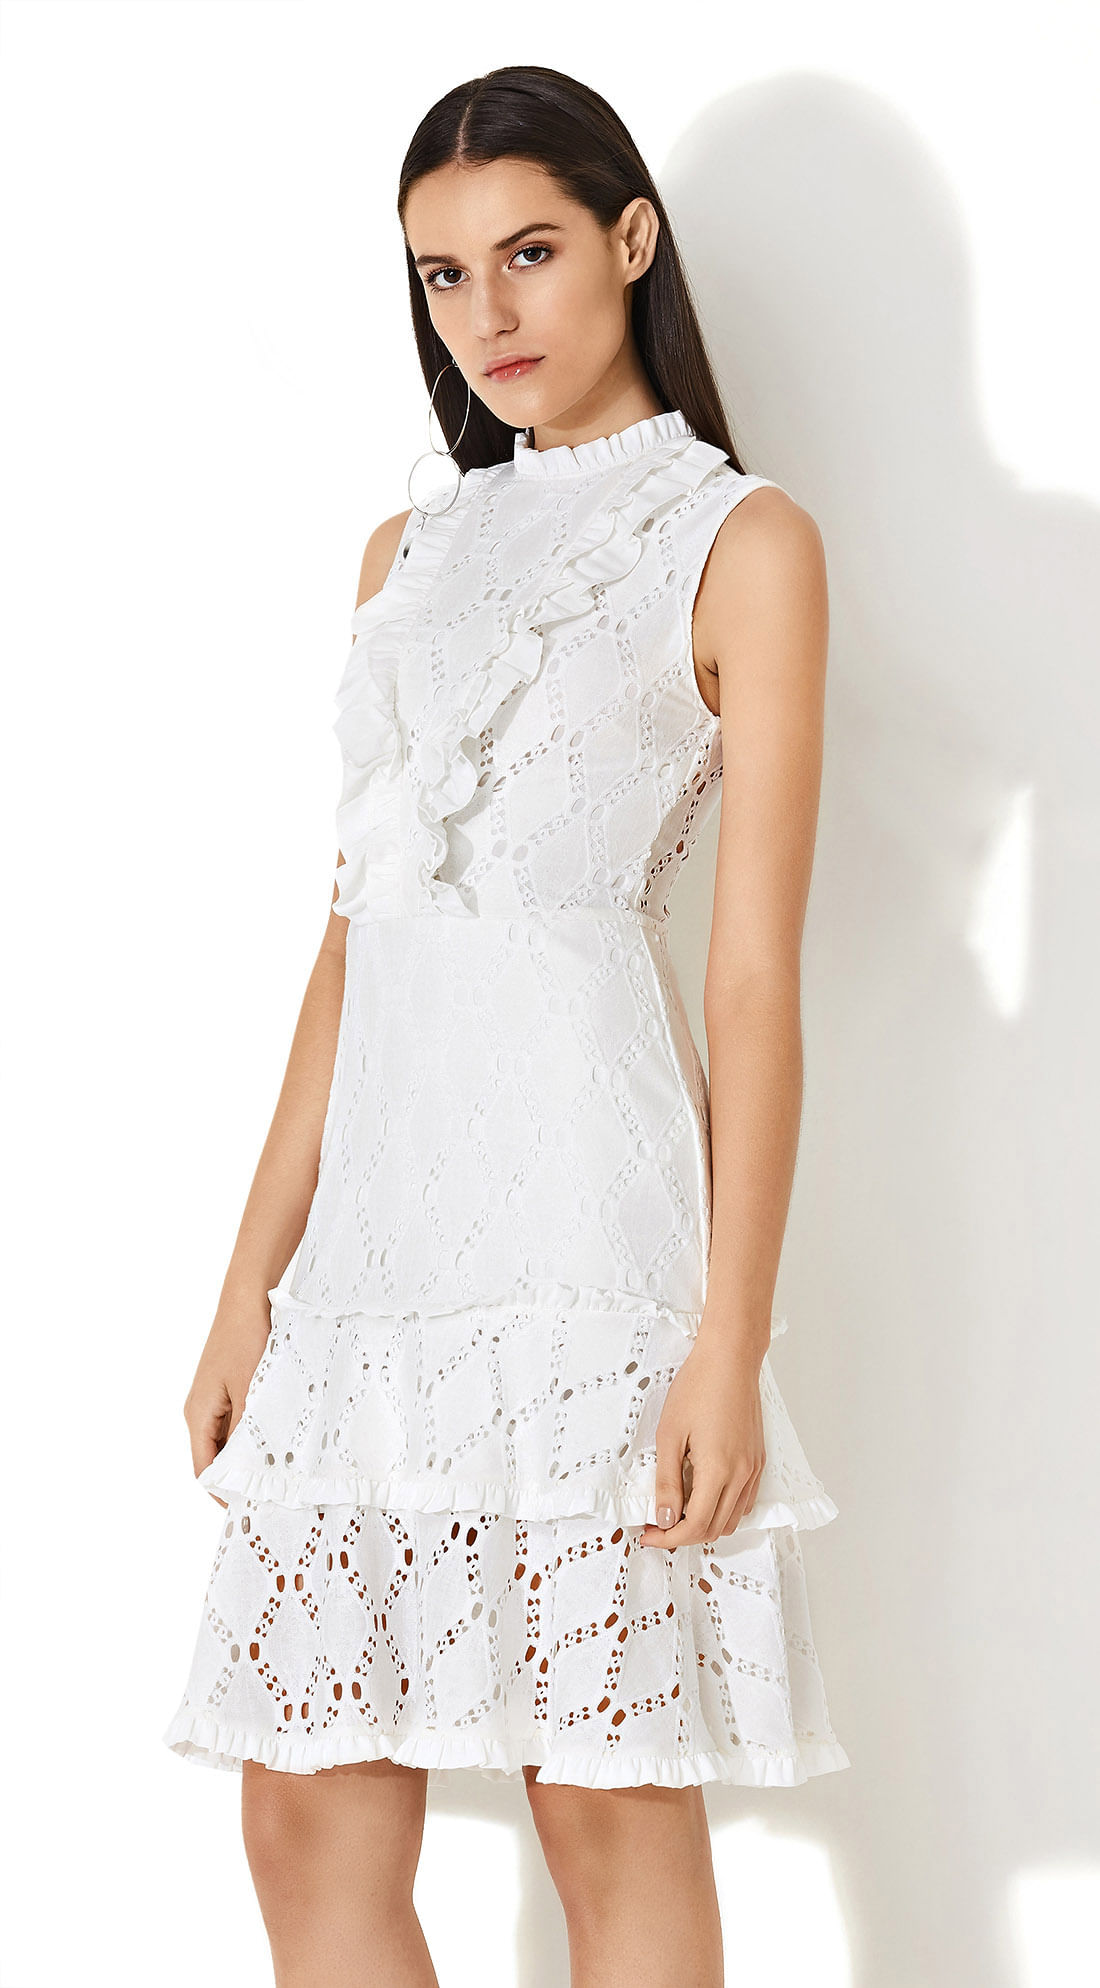 a055b2ee1 Vestido Babado Compose De Tecidos Off White - morenarosa